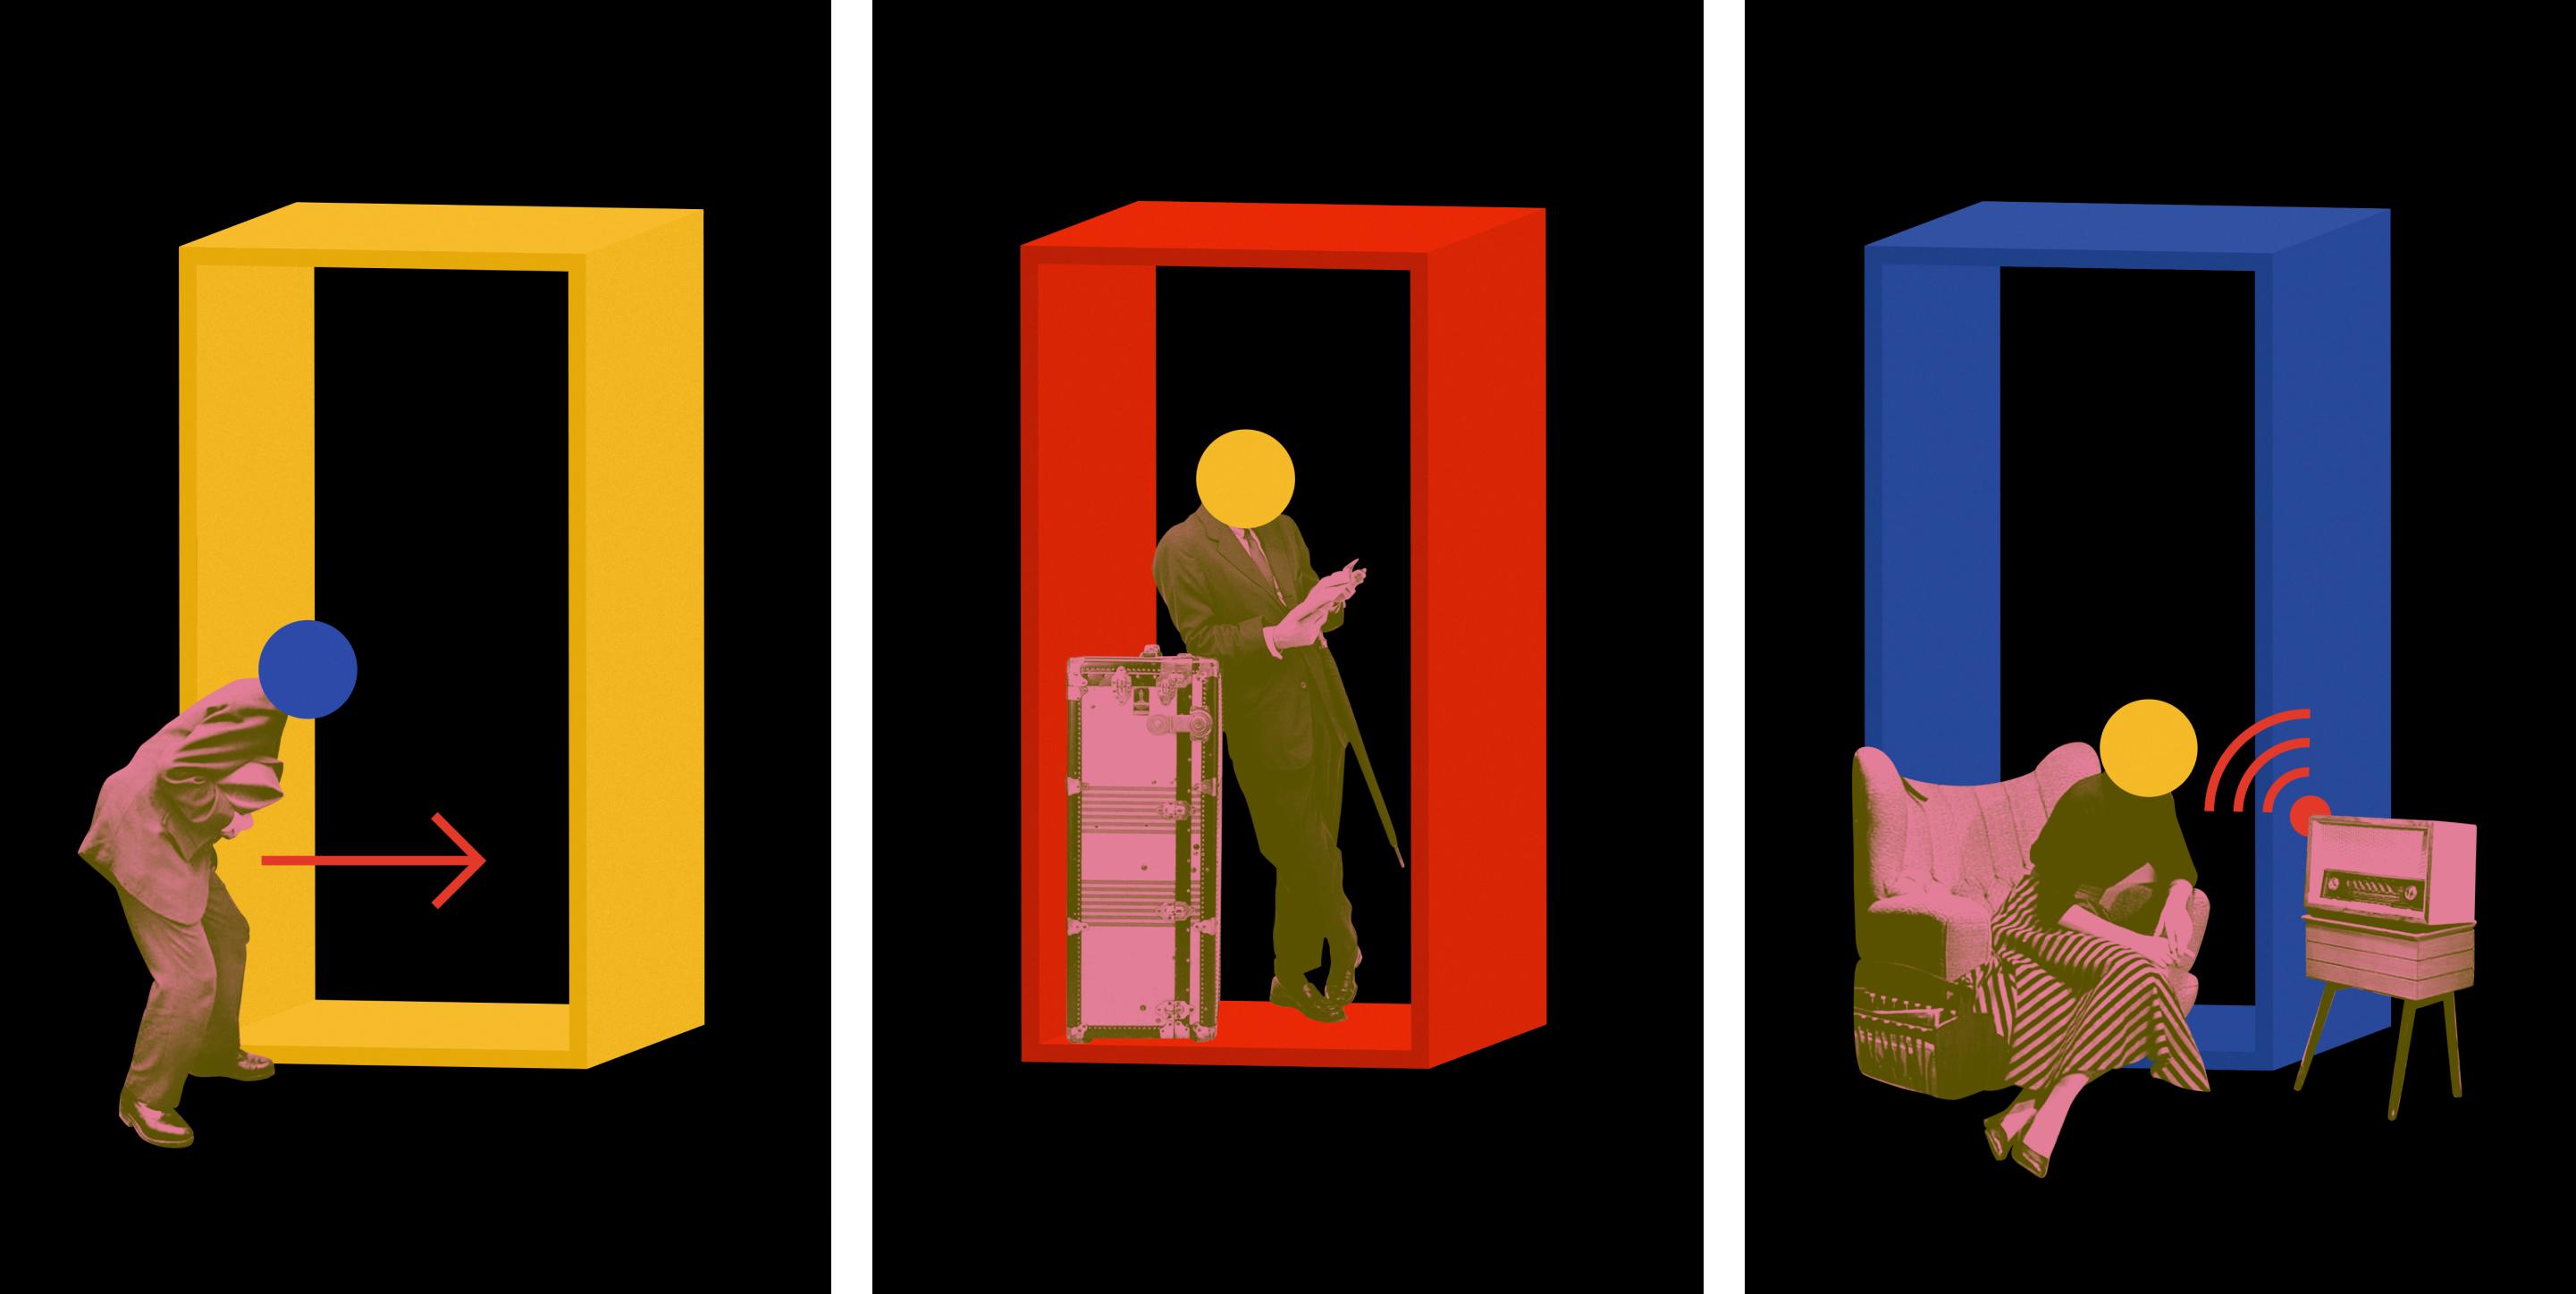 illuminating radioactivity collages design